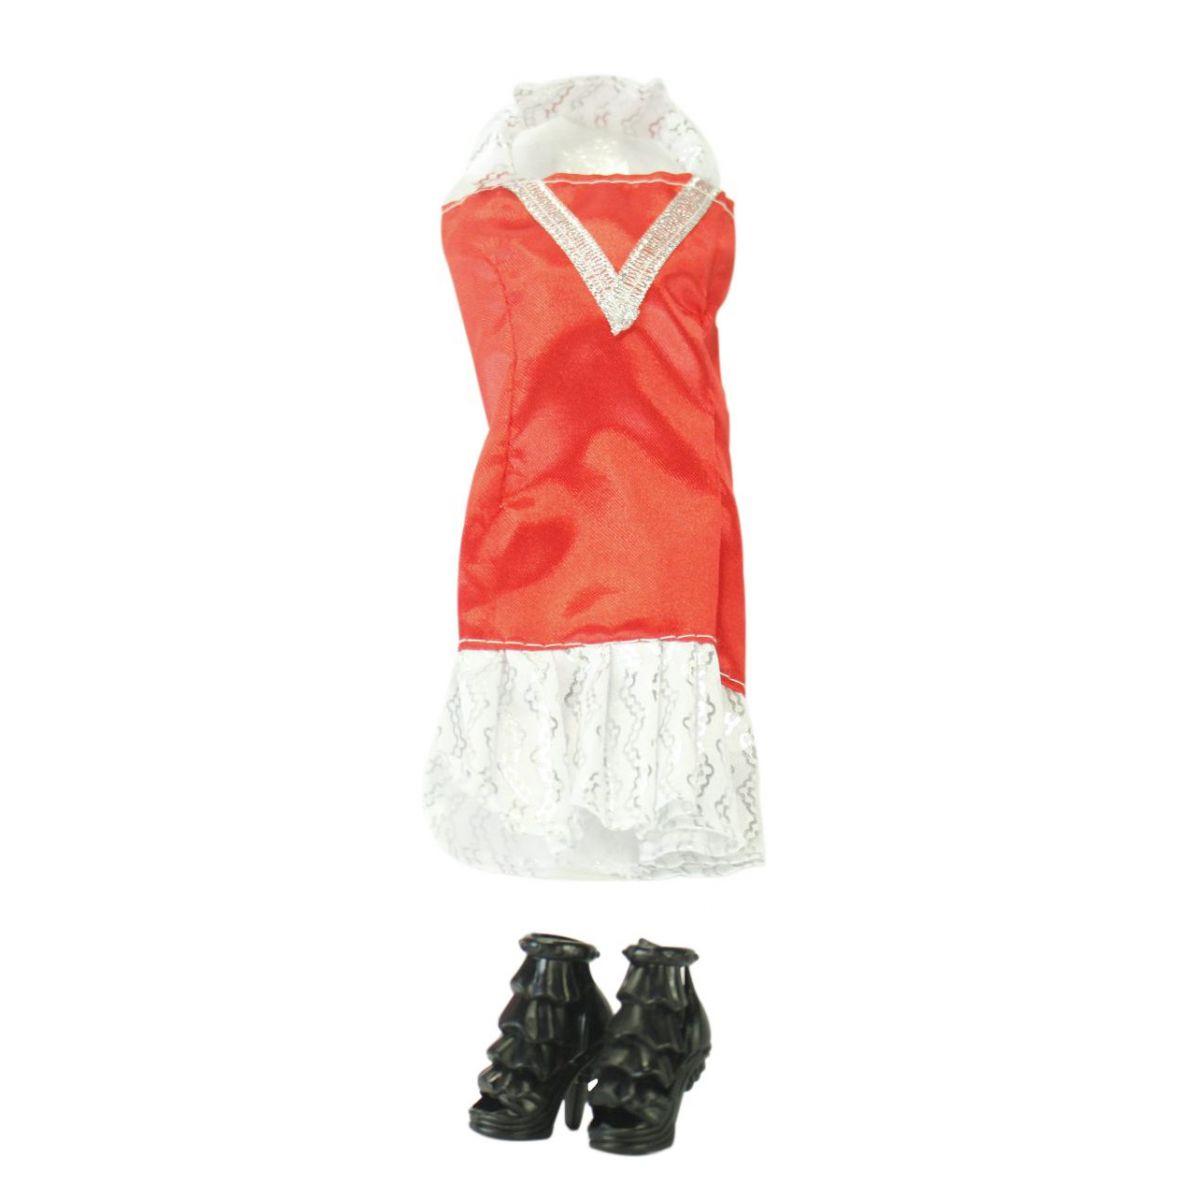 EPline Šatičky pro panenky s doplňky červeno-stříbrné šaty